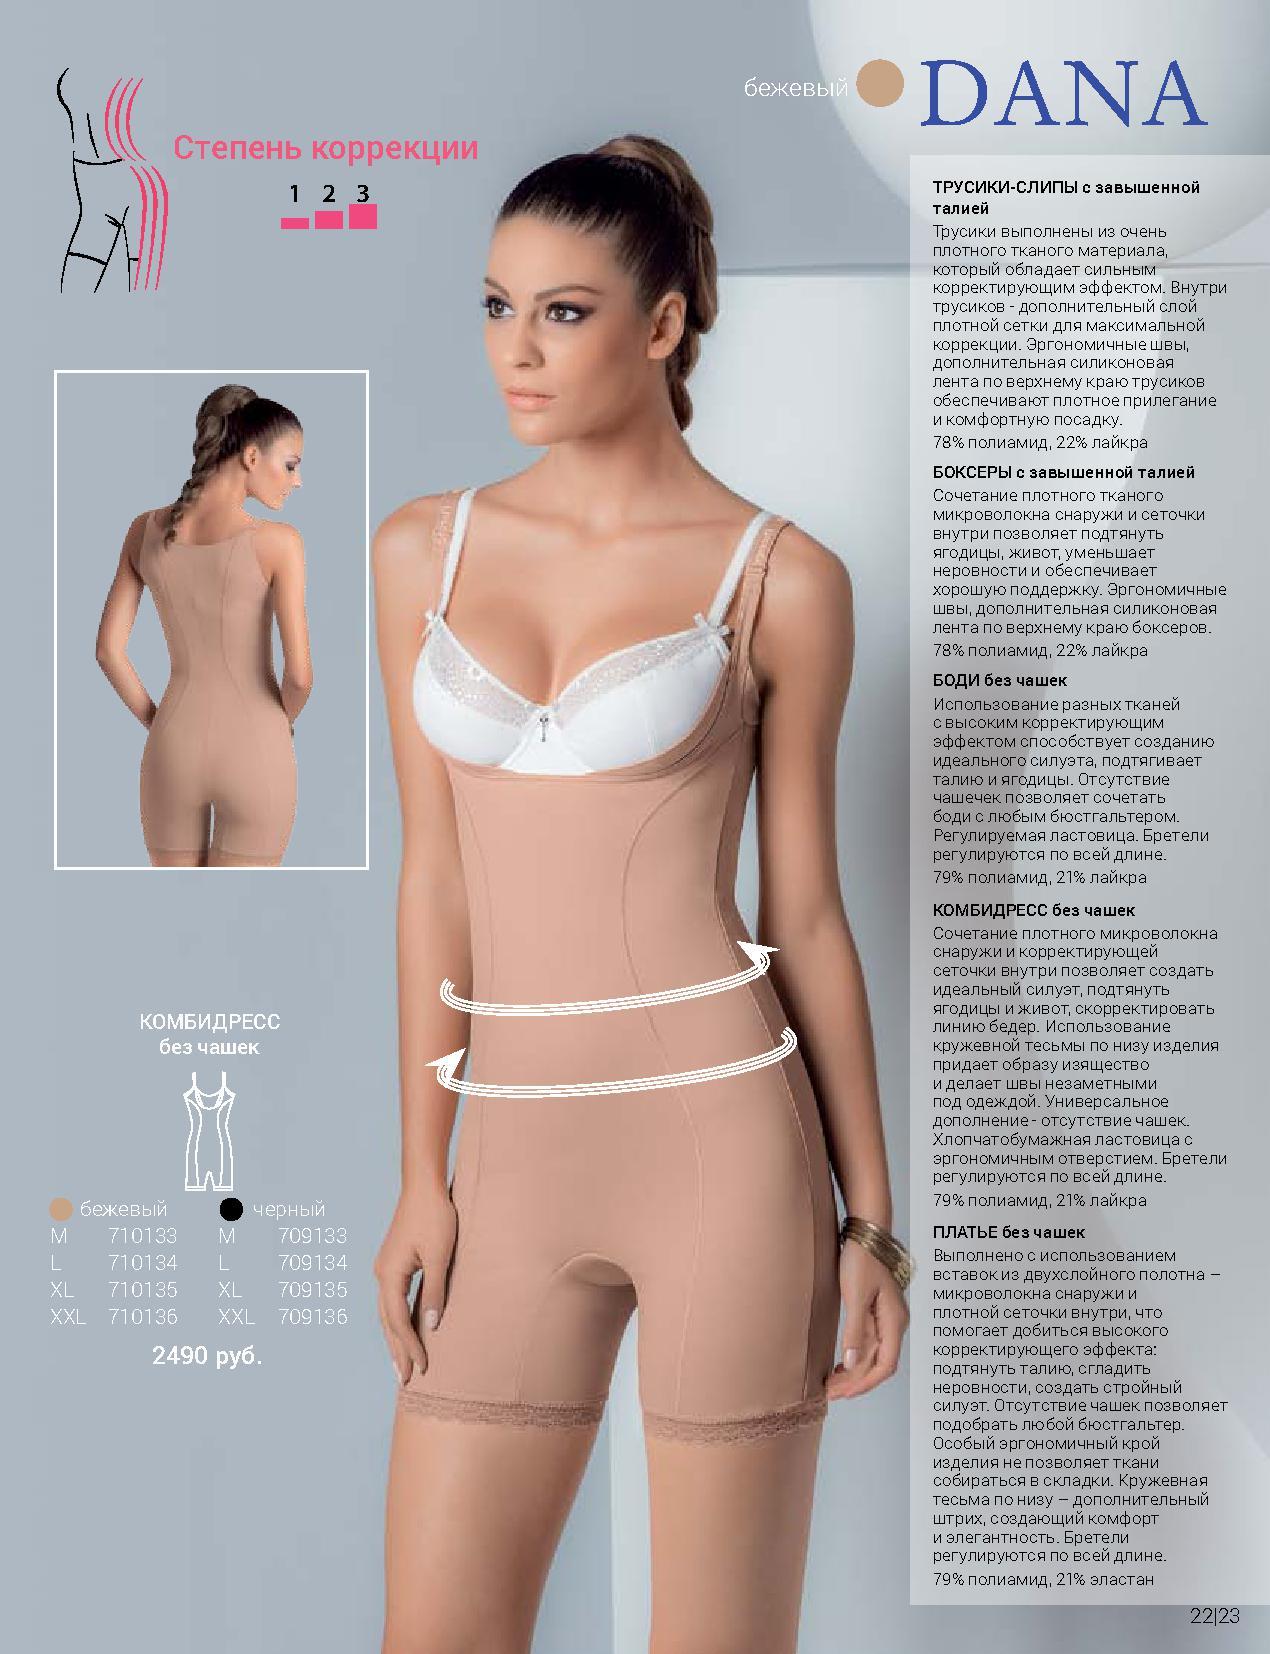 Флоранж - комплект коррекции Дана - платье, боди, боксеры, комбидресс и трусики-слипы